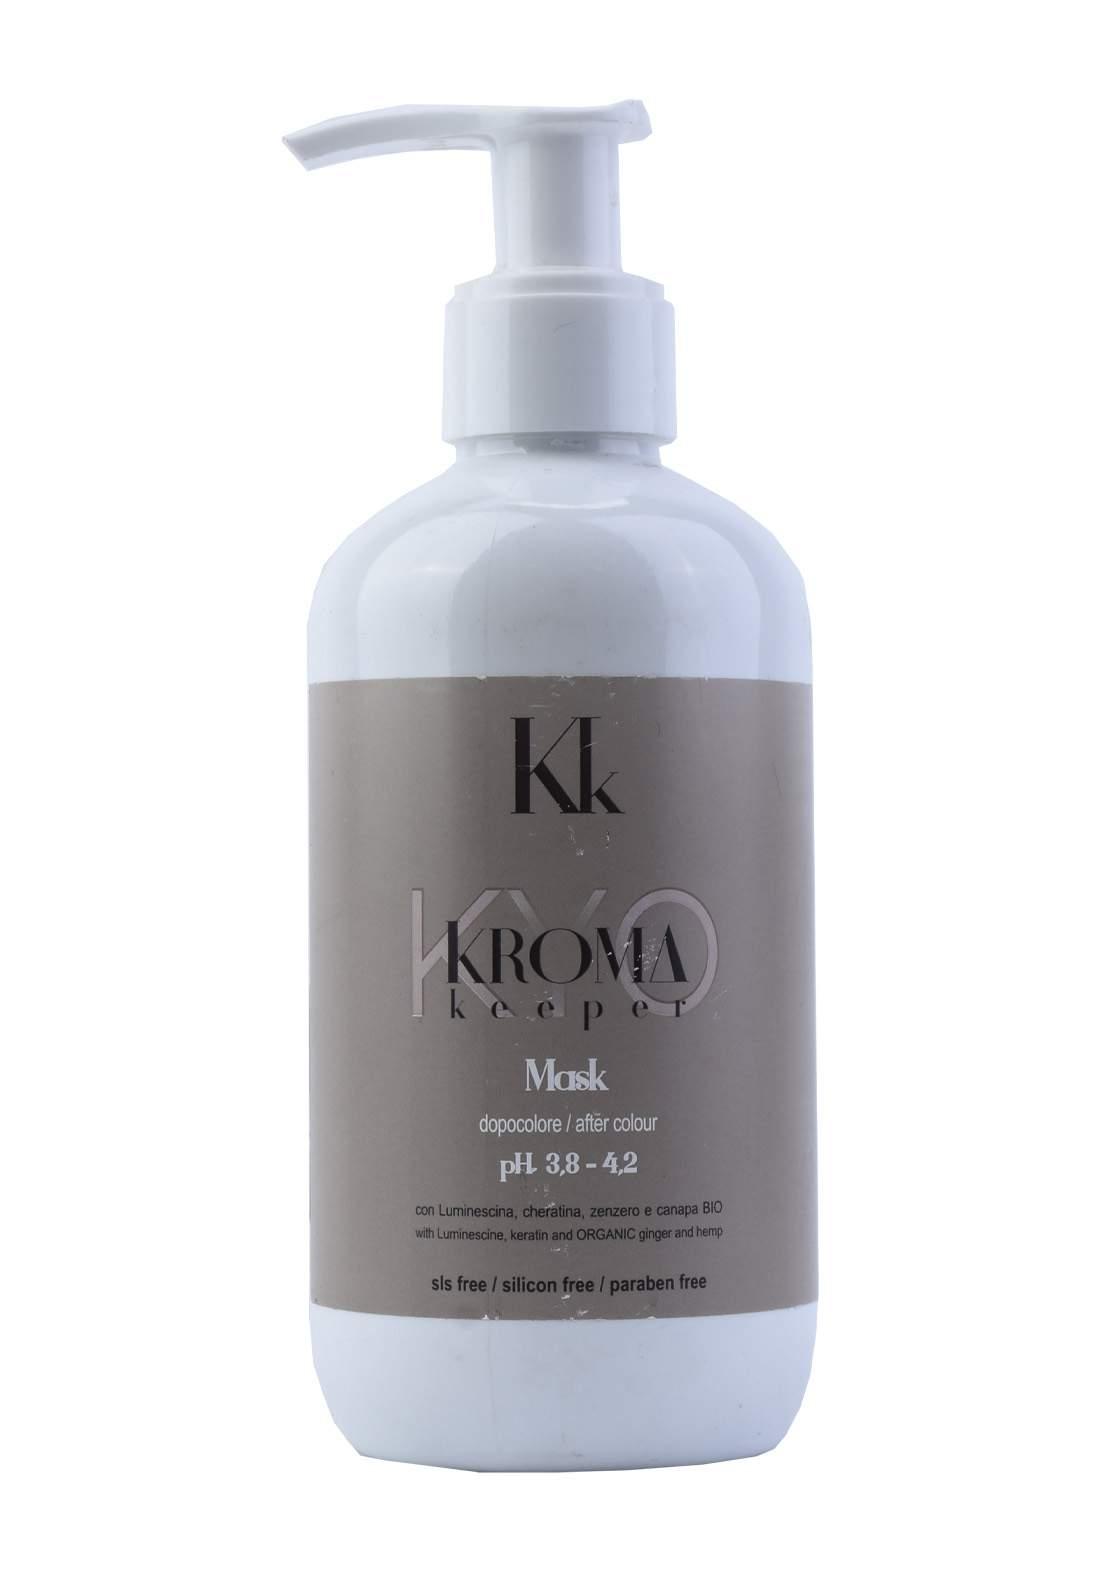 Kyo Kroma Keeper Mask 250ml ماسك للشعر